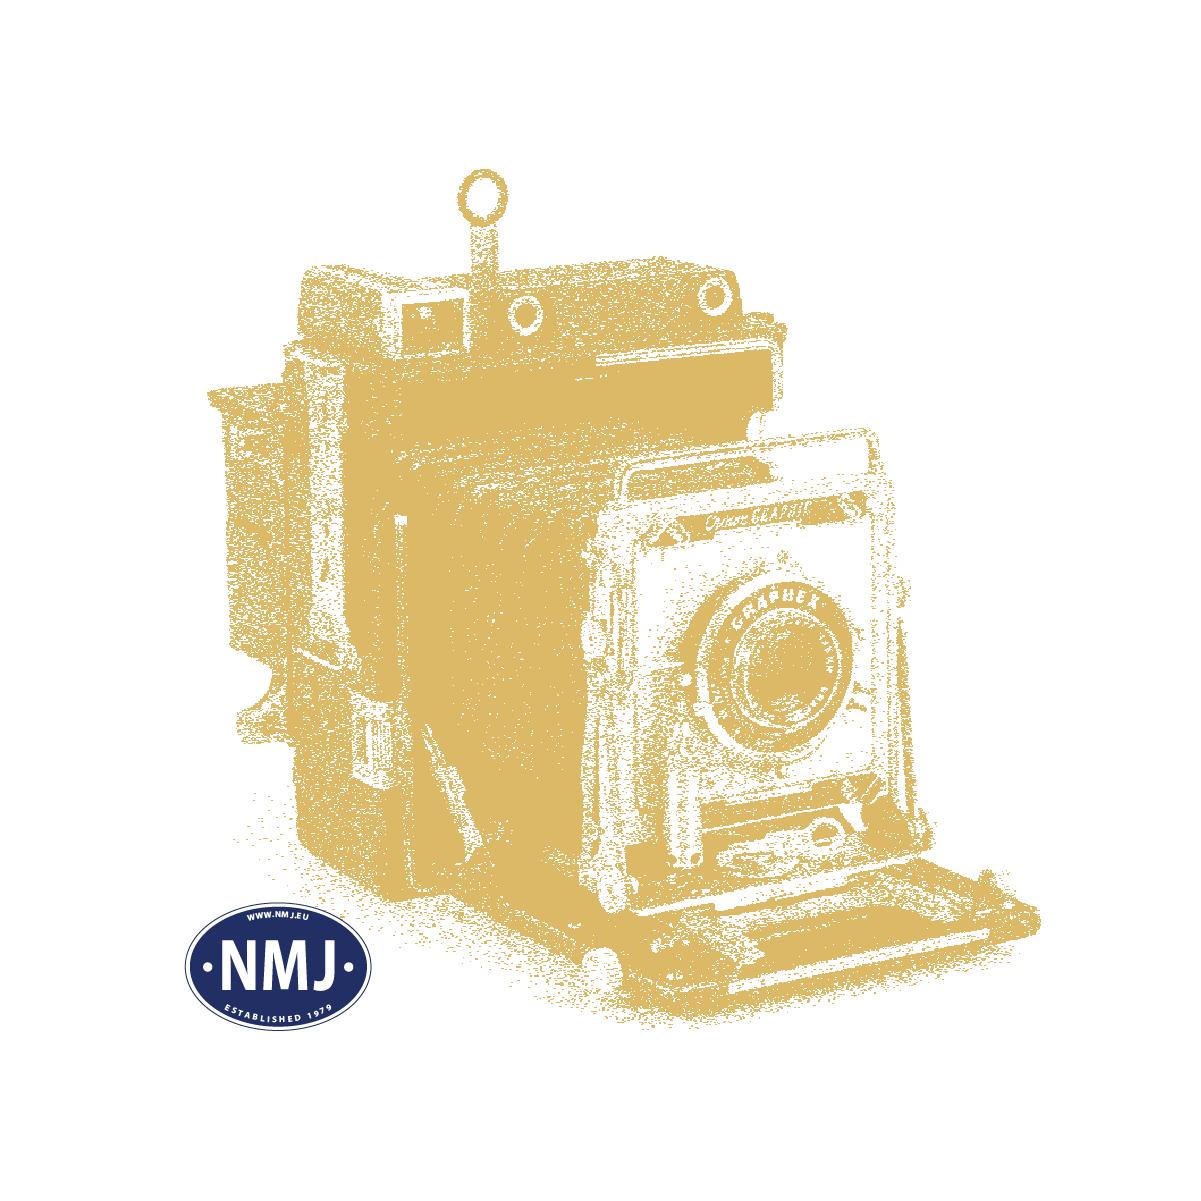 NMJT131.101 - NMJ Topline NSB B3-2 25513 type 3, Red/Brown Livery